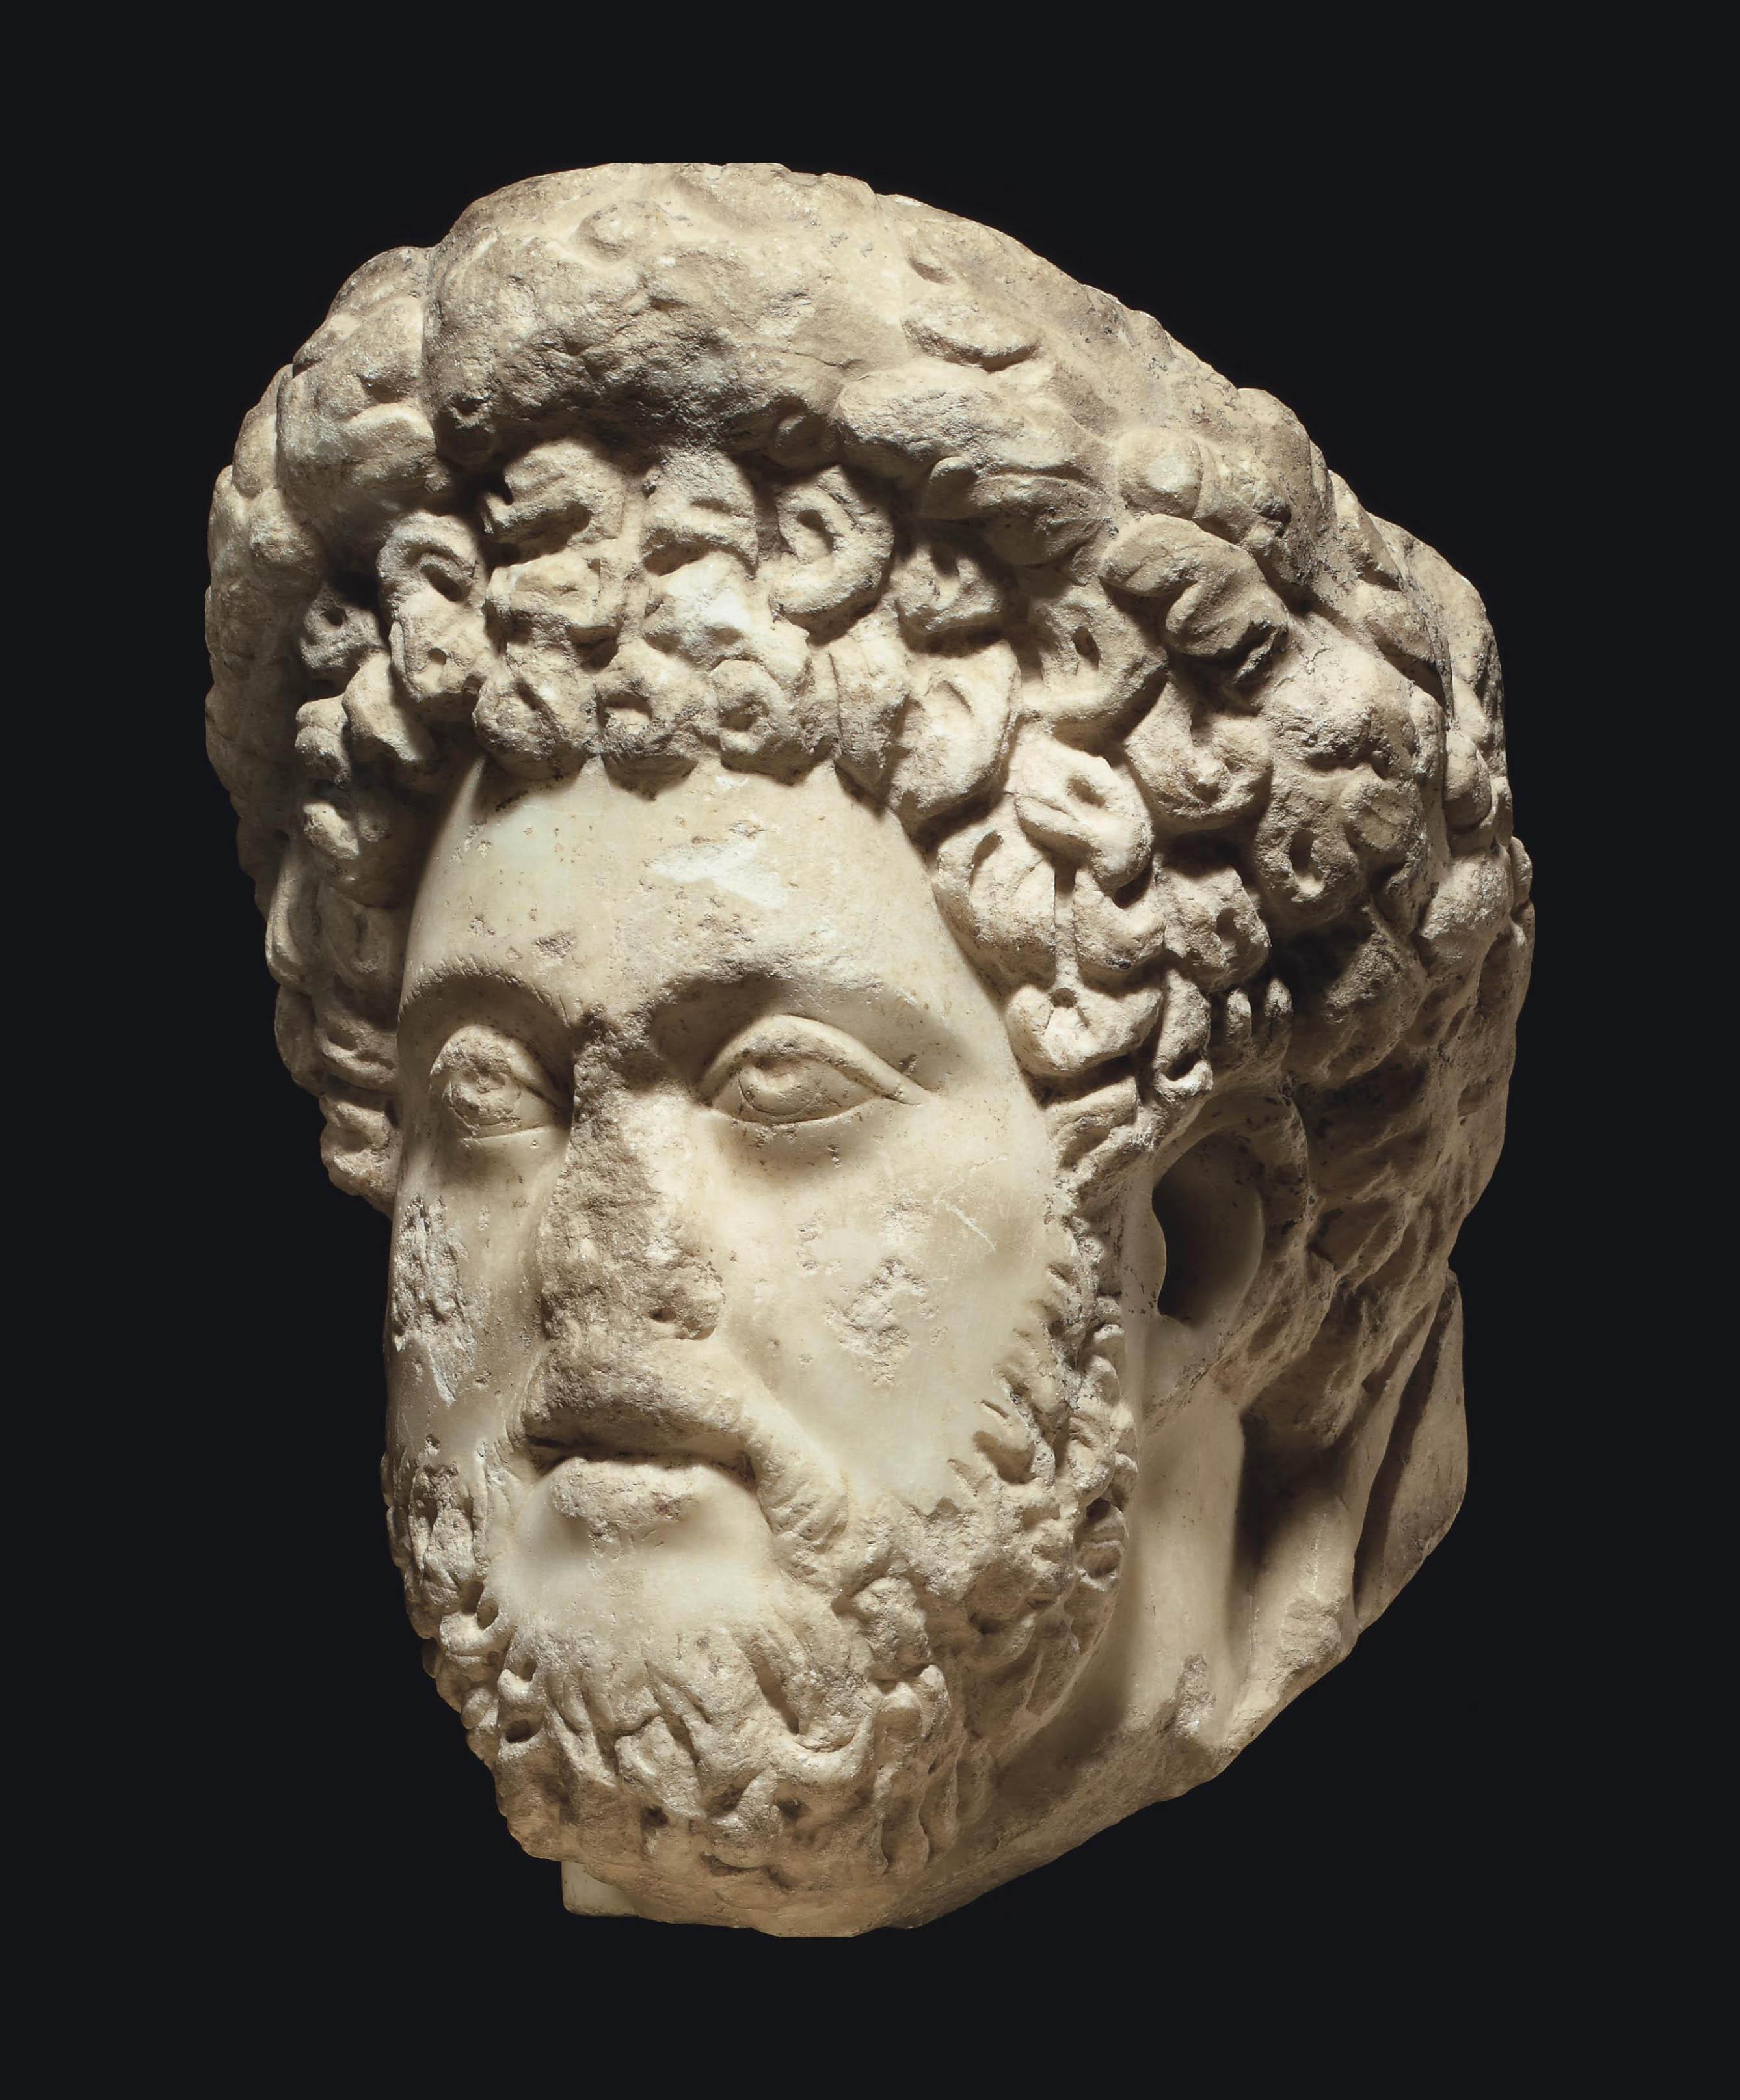 A ROMAN MARBLE PORTRAIT HEAD OF THE EMPEROR COMMODUS